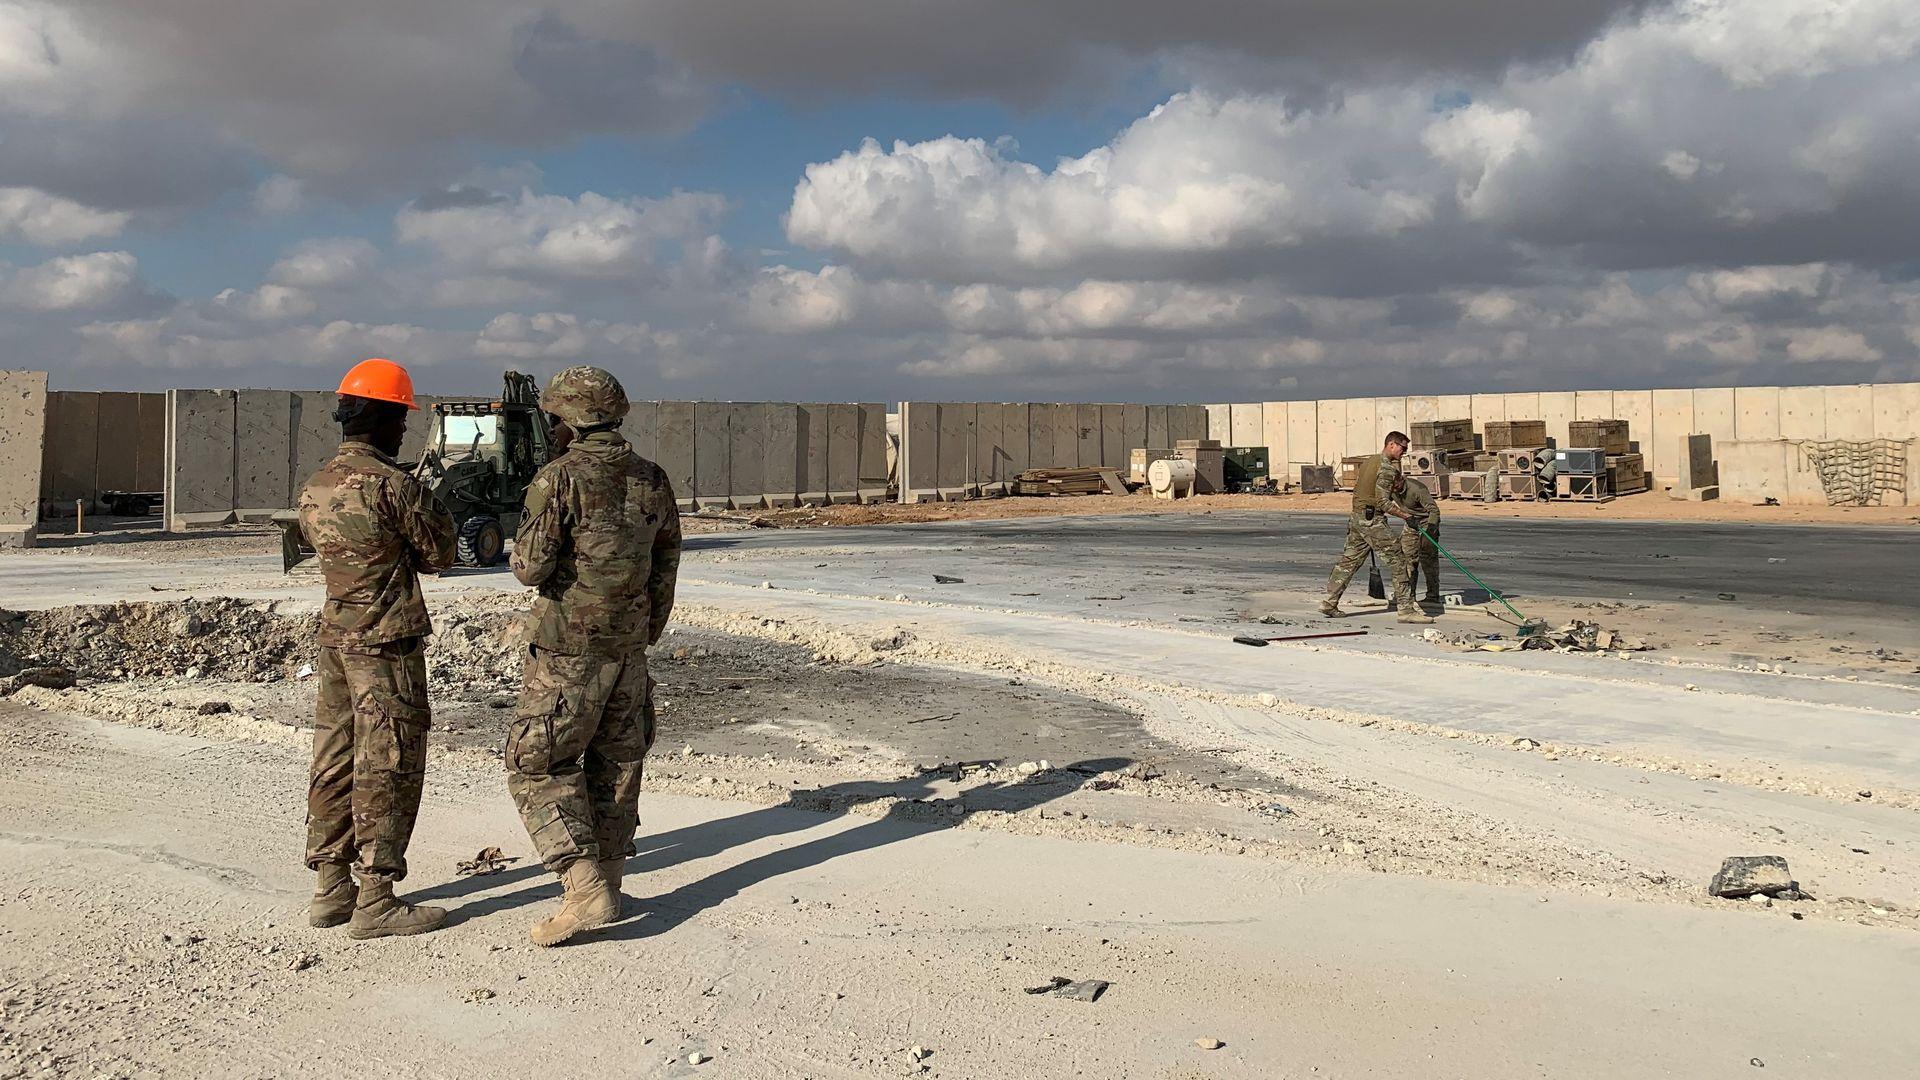 Ain al-Asad  U.S. military airbase in Iraq